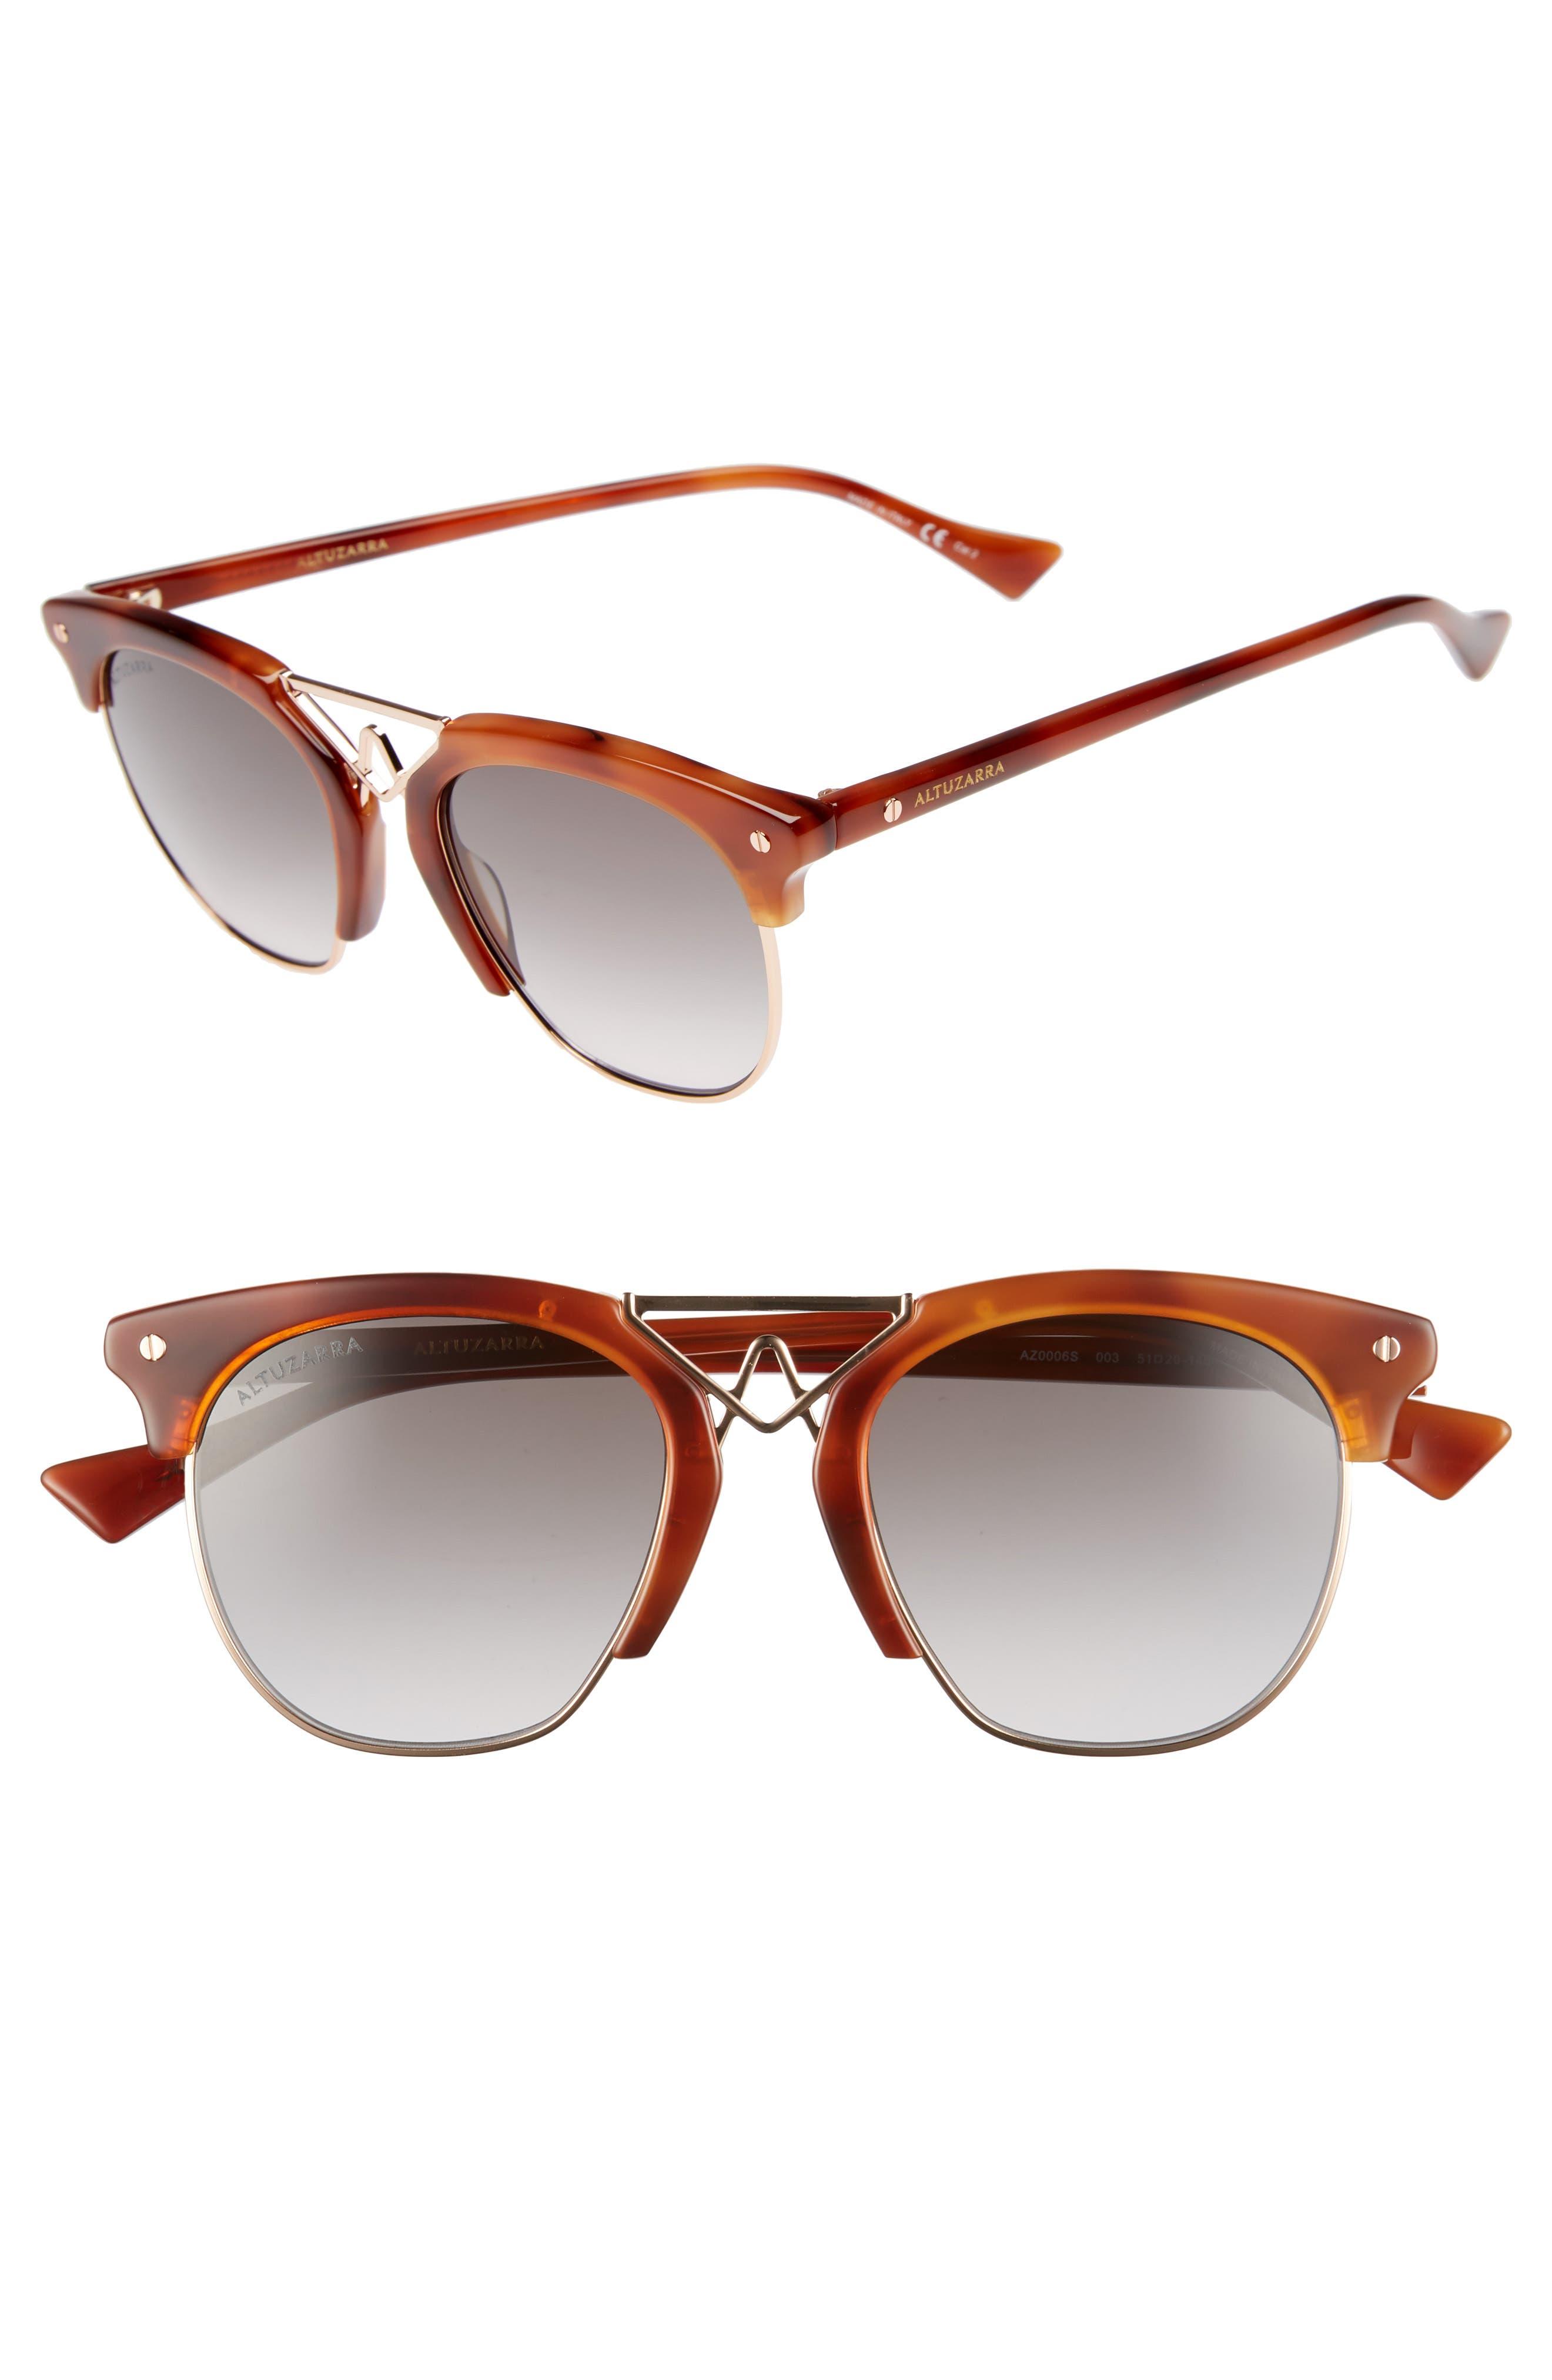 51mm Round Sunglasses,                         Main,                         color, Havana